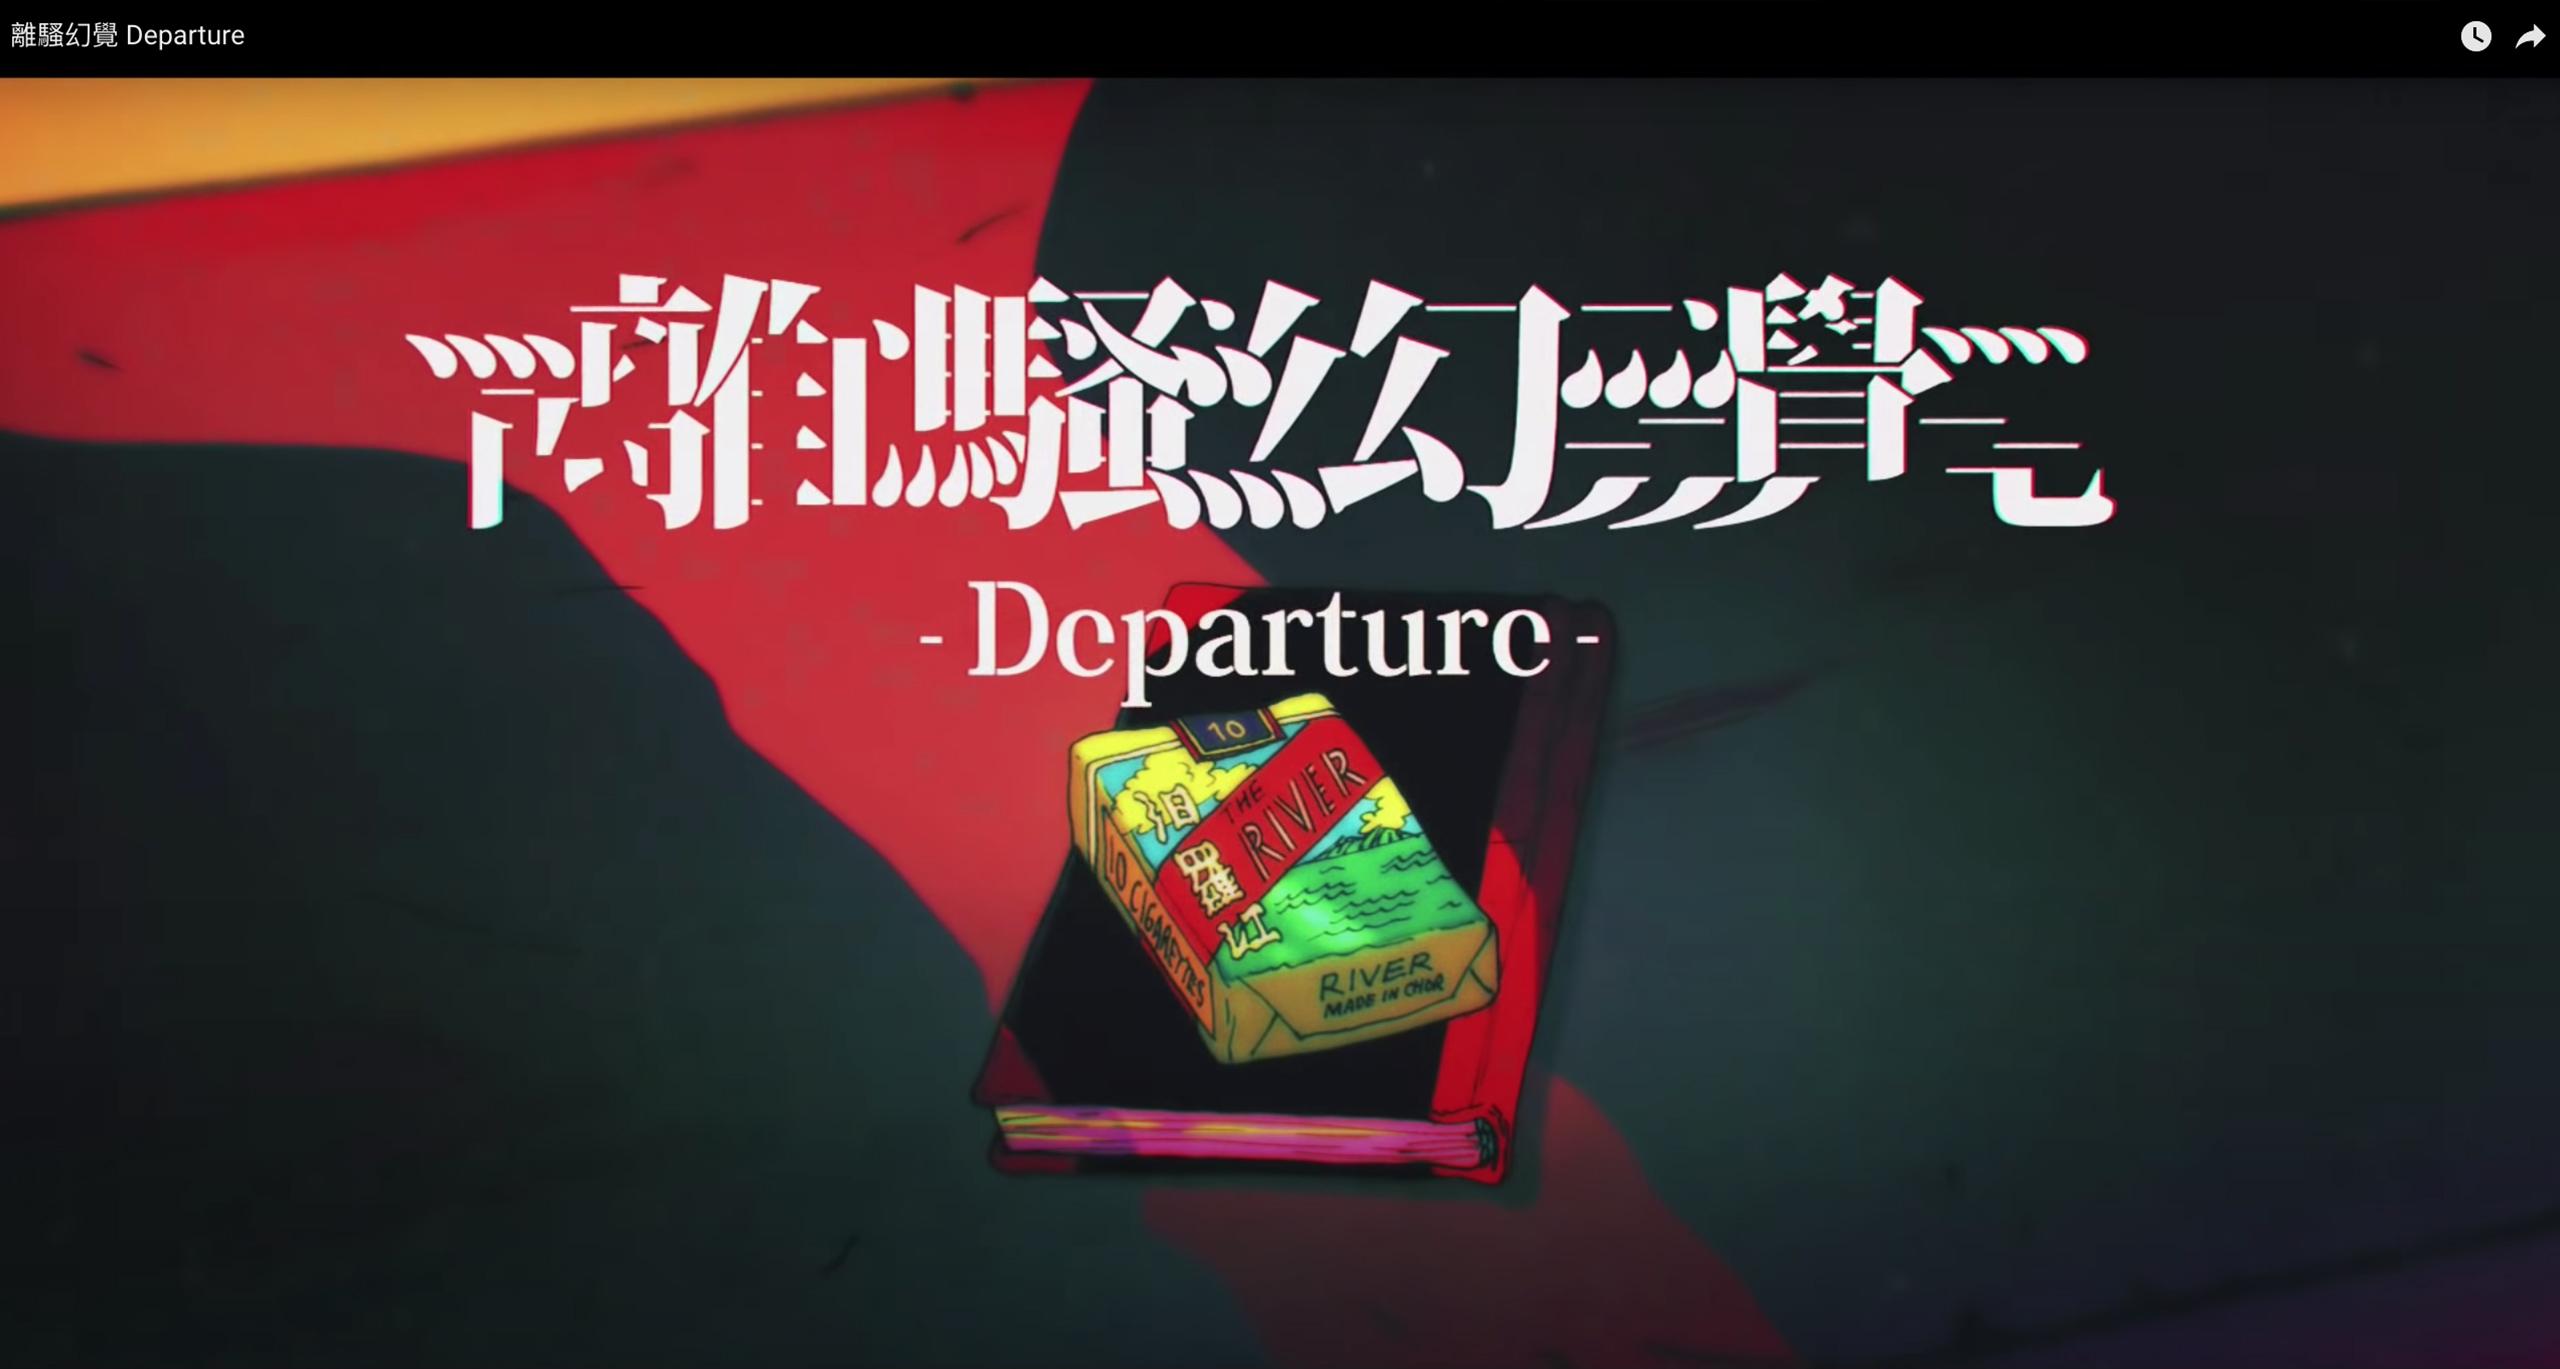 Departure Trailer